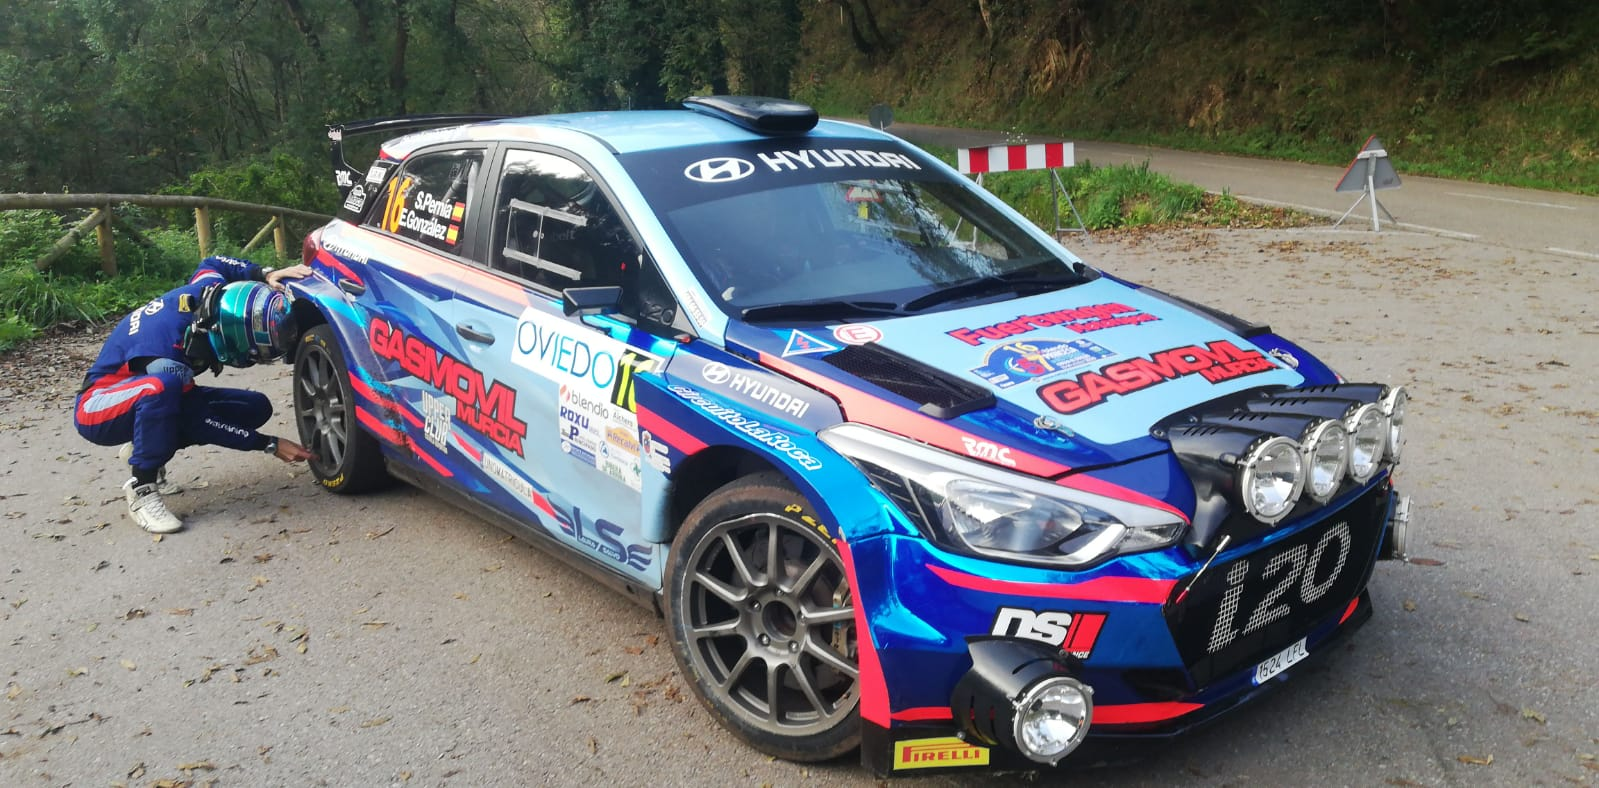 CERA + ERT: 57º Rallye Princesa de Asturias - Ciudad de Oviedo [23-24 Octubre] - Página 2 20201024093448